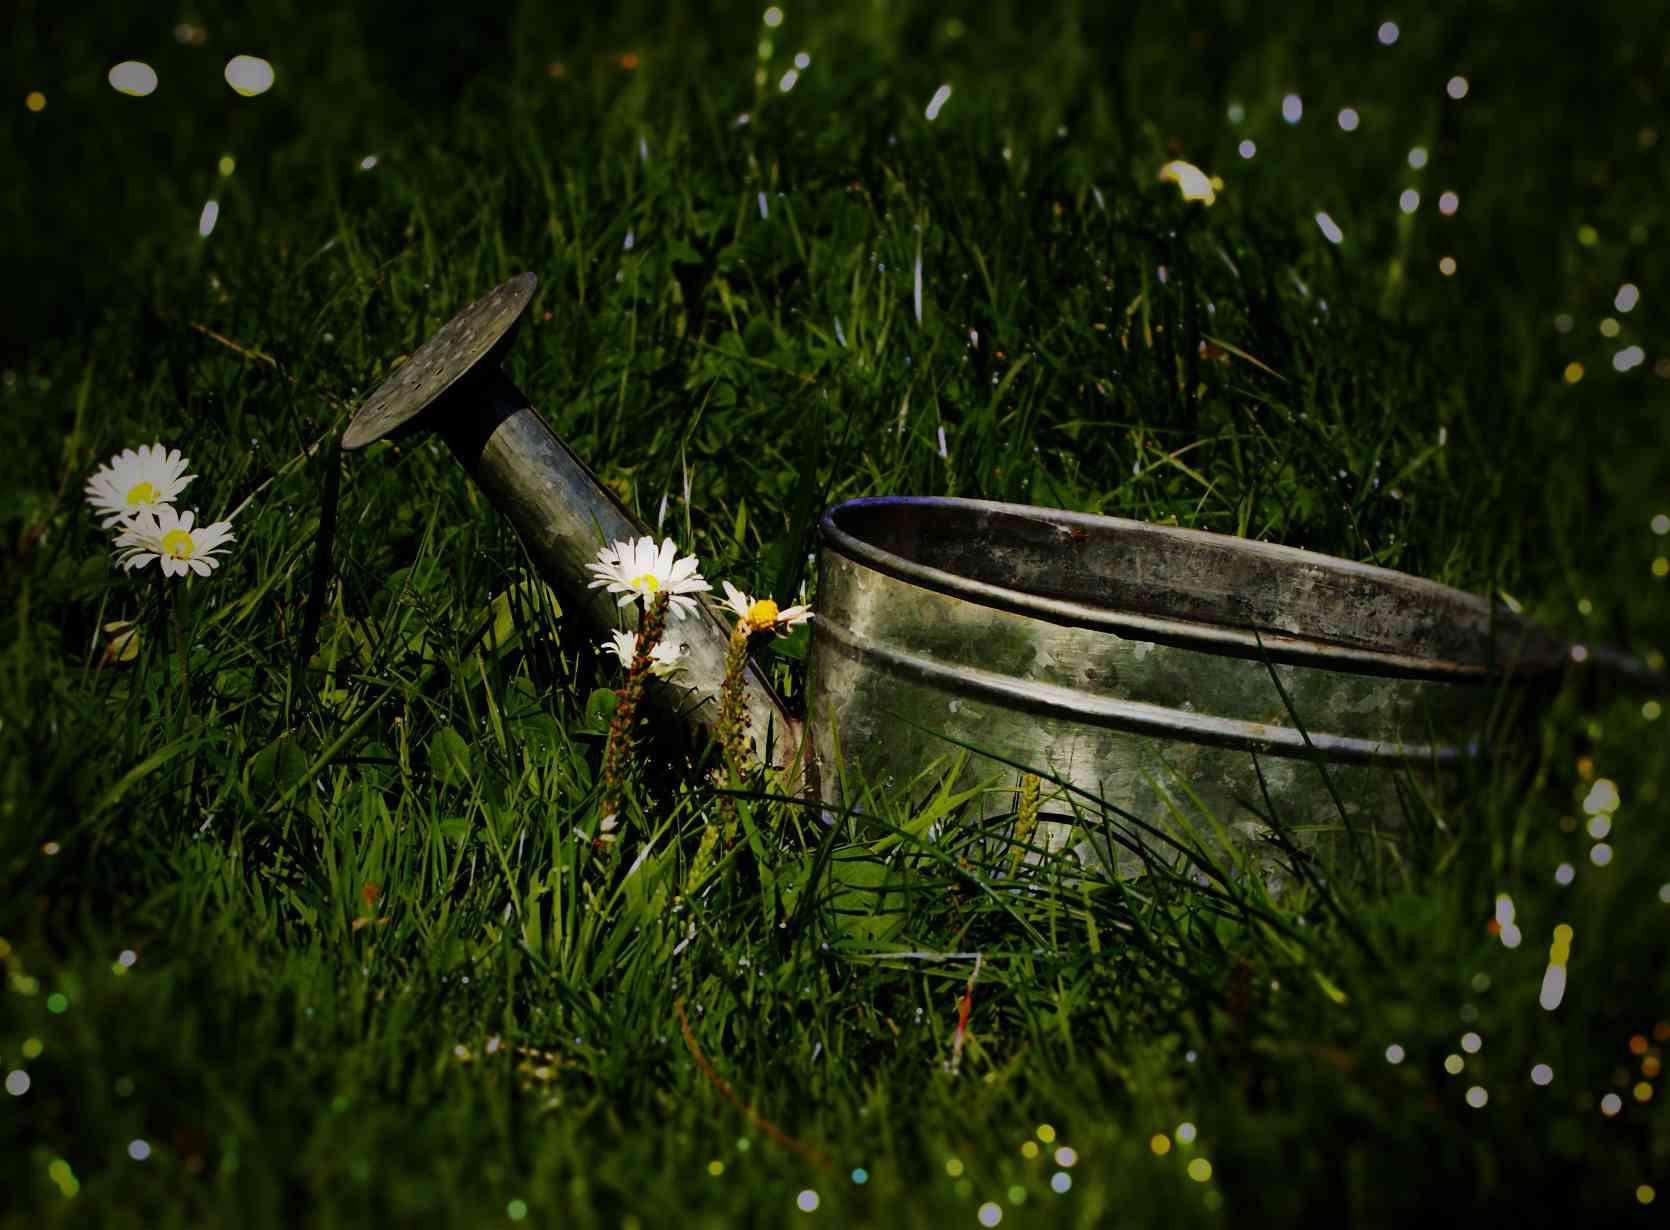 lawn-watering-